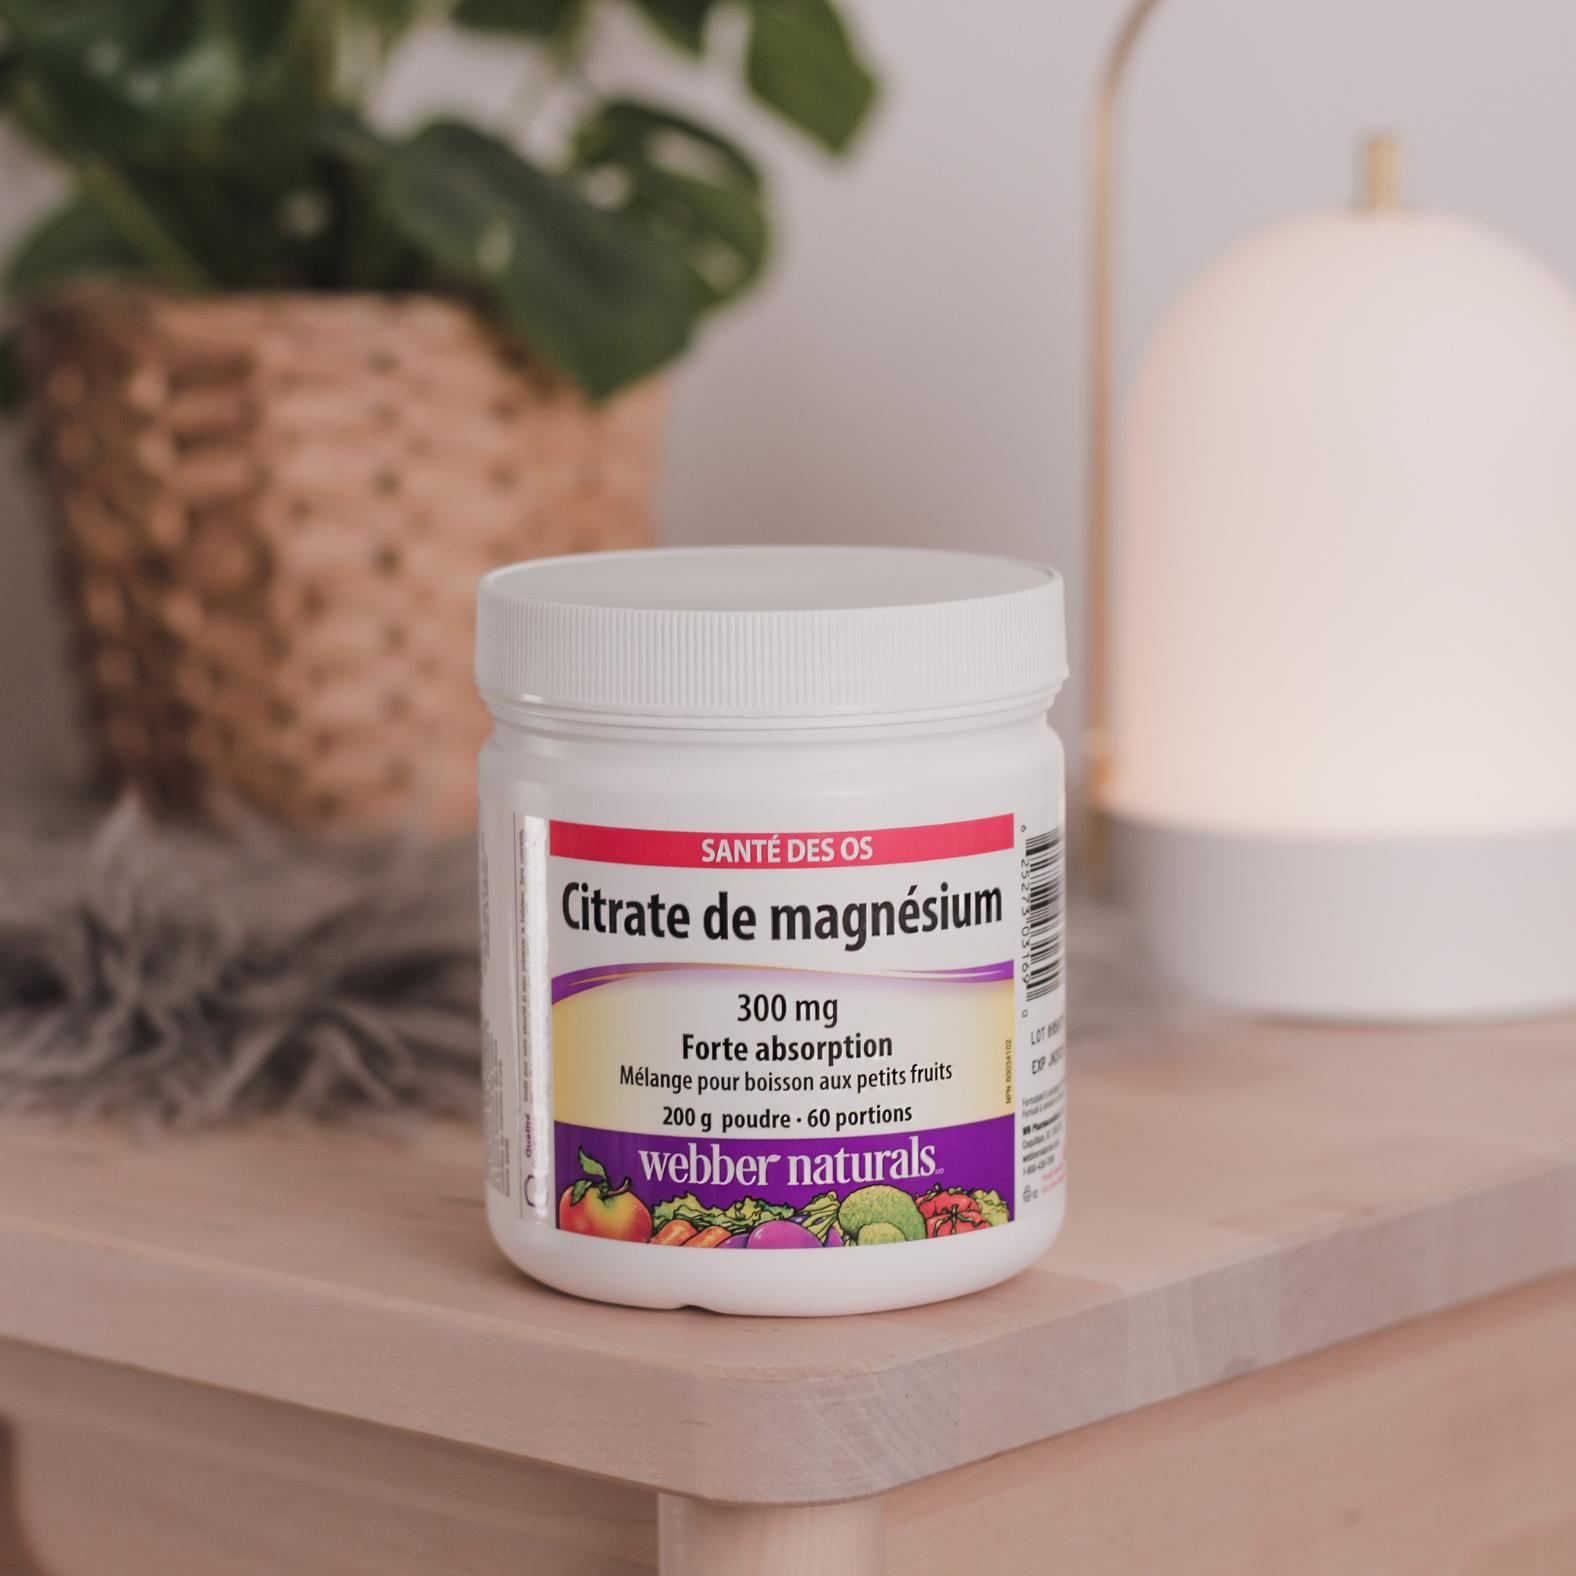 Citrate de magnésium-enhanced-pg-3169